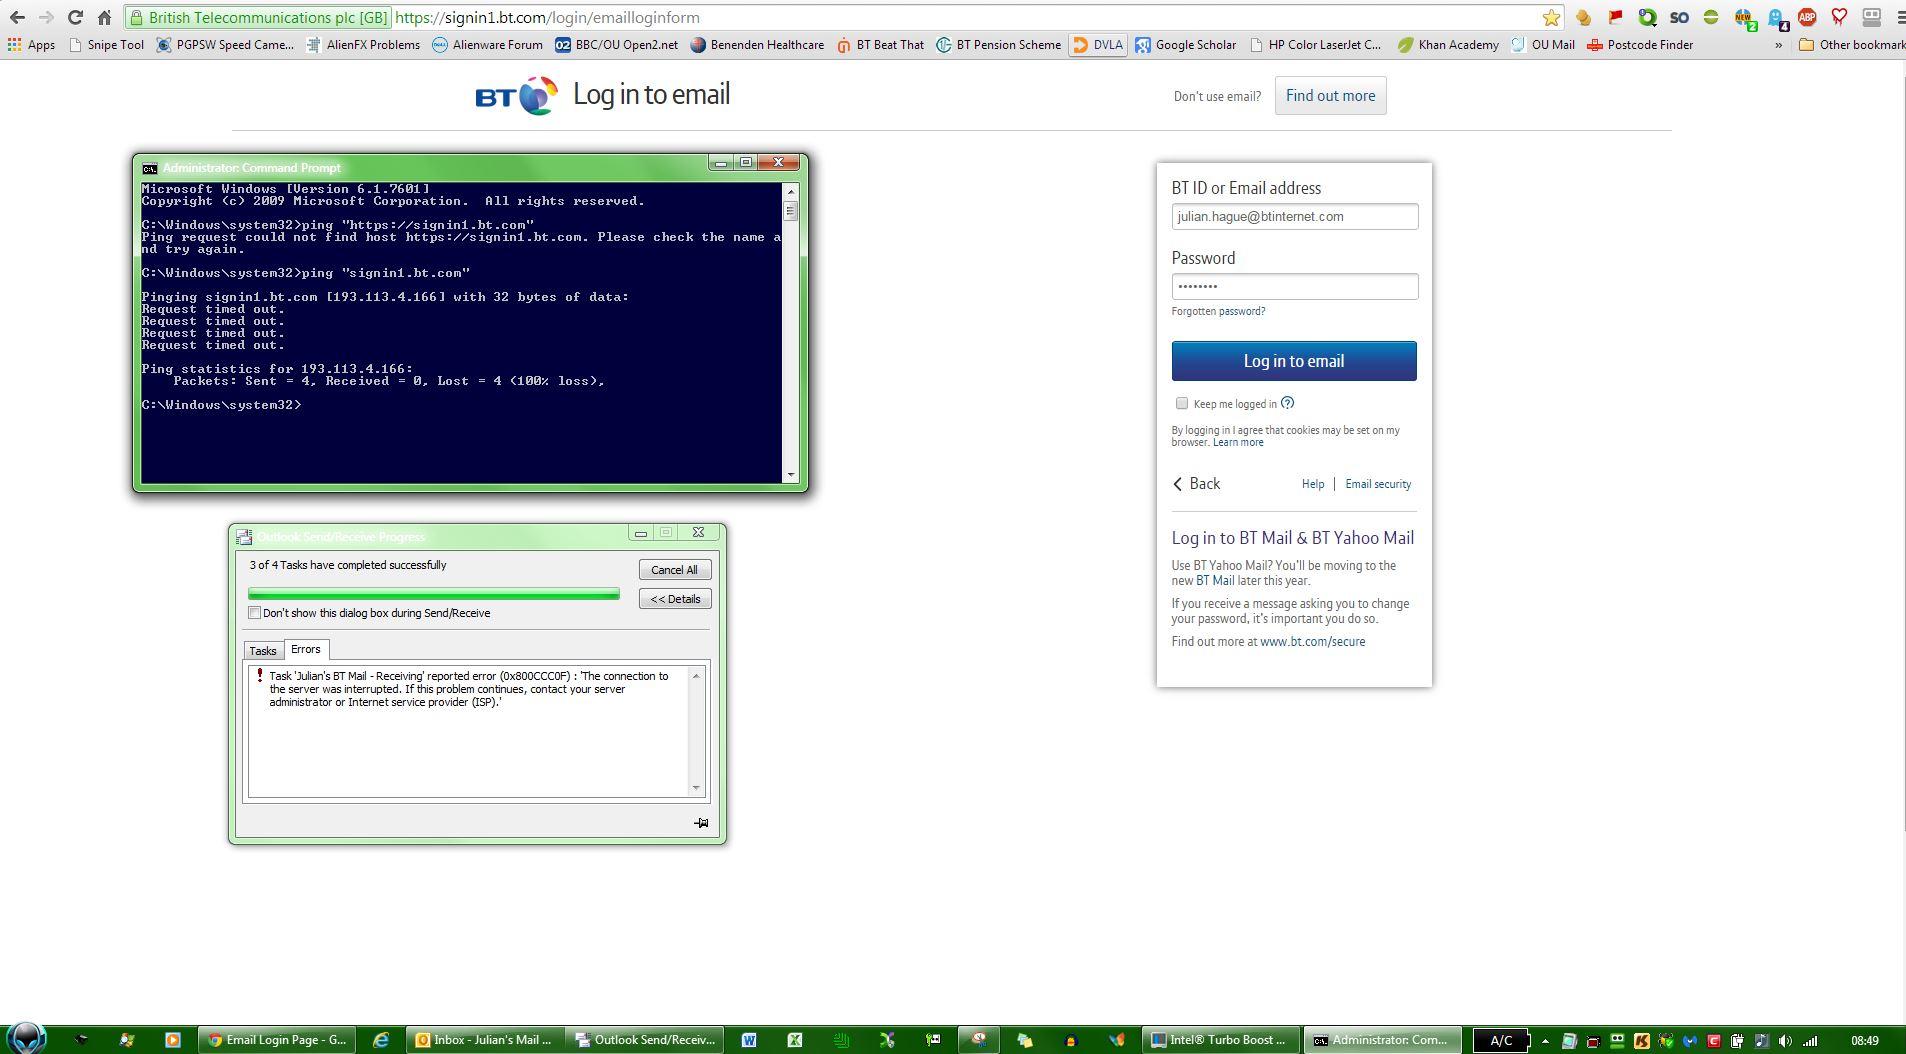 BT Web Mail Log In 29-9-14.JPG